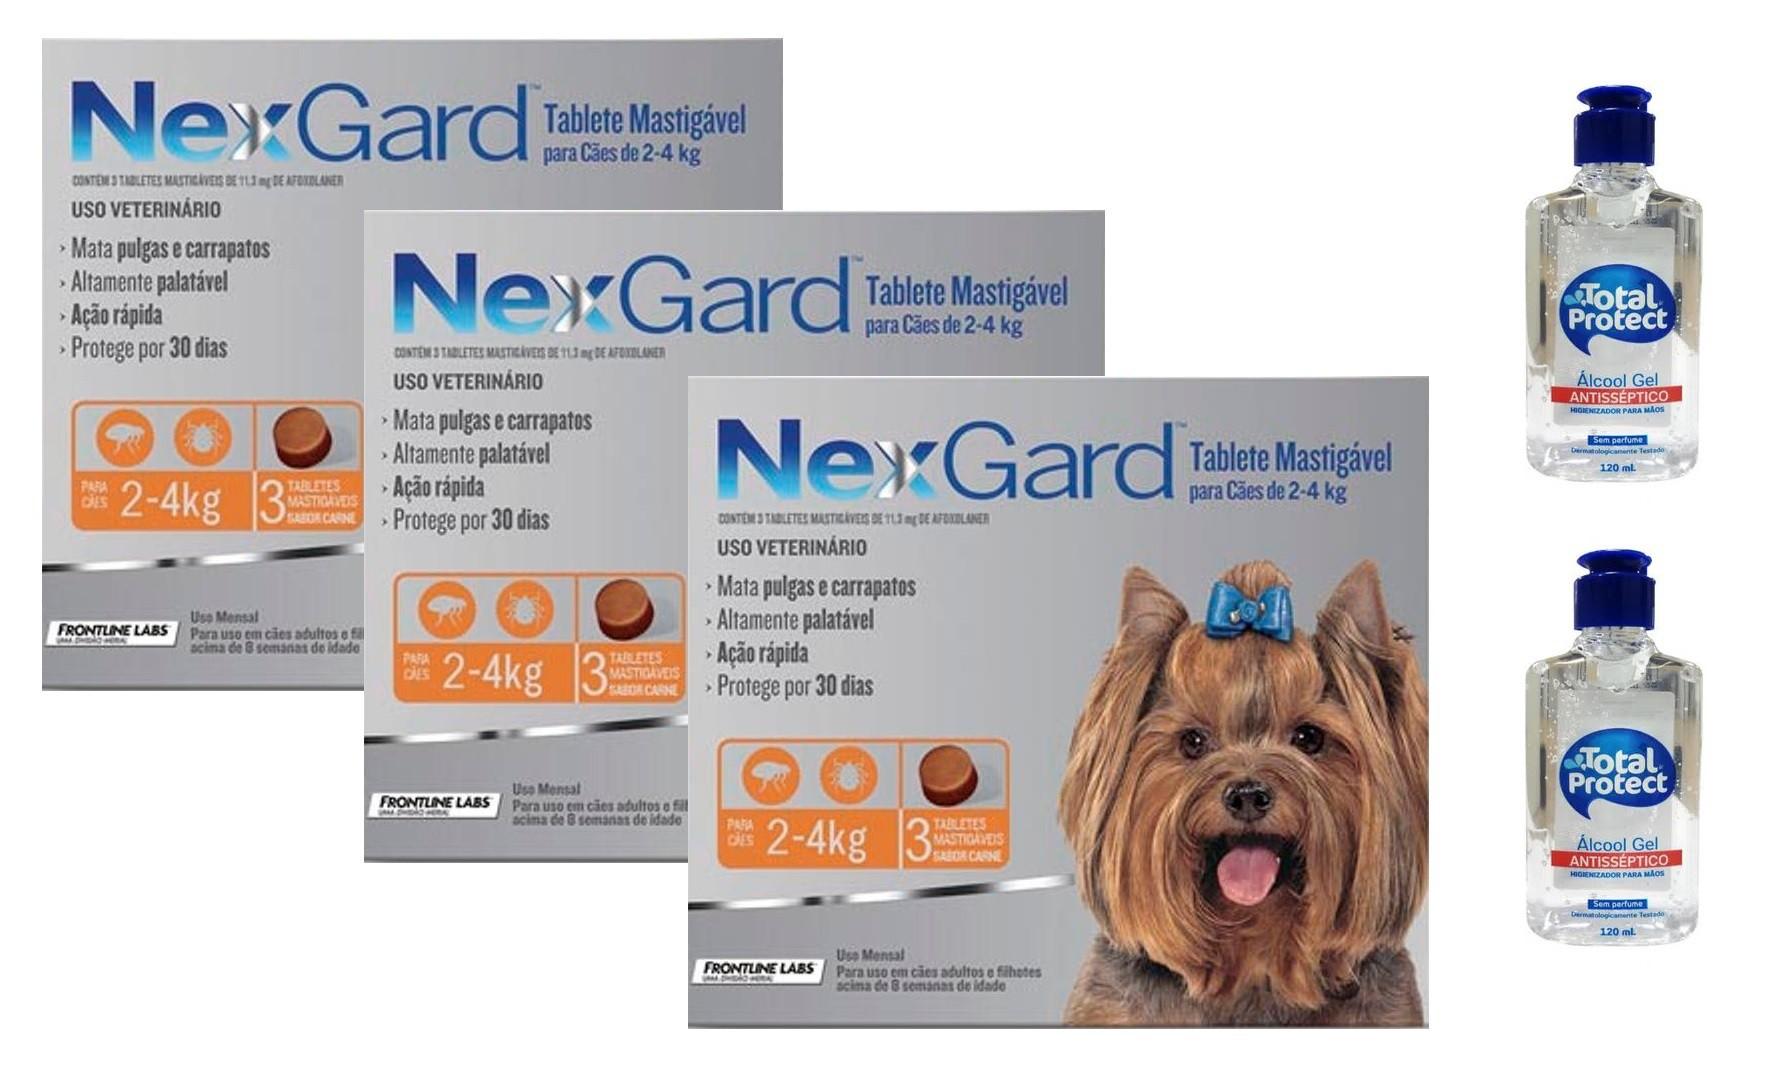 Kit 3 Unidades Antipulgas e Carrapatos Nexgard 11,3mg para Cães de 2 a 4kg (3 tabletes) - Boehringer Ingelheim + Brinde 2 Álcool Gel 120ml Total Protect